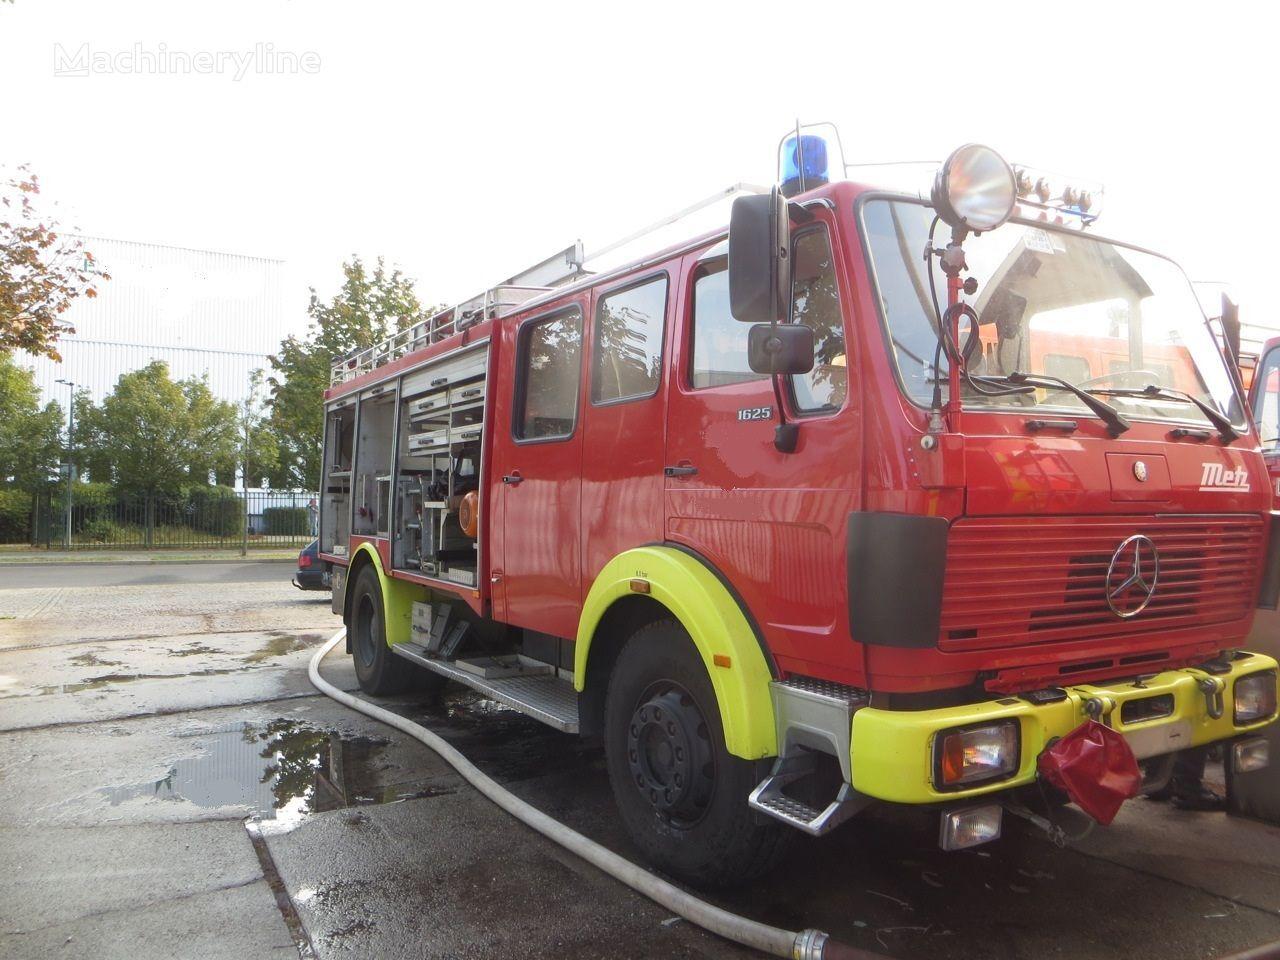 MERCEDES-BENZ 1625 HLF Wasser und Schaumtank fire truck